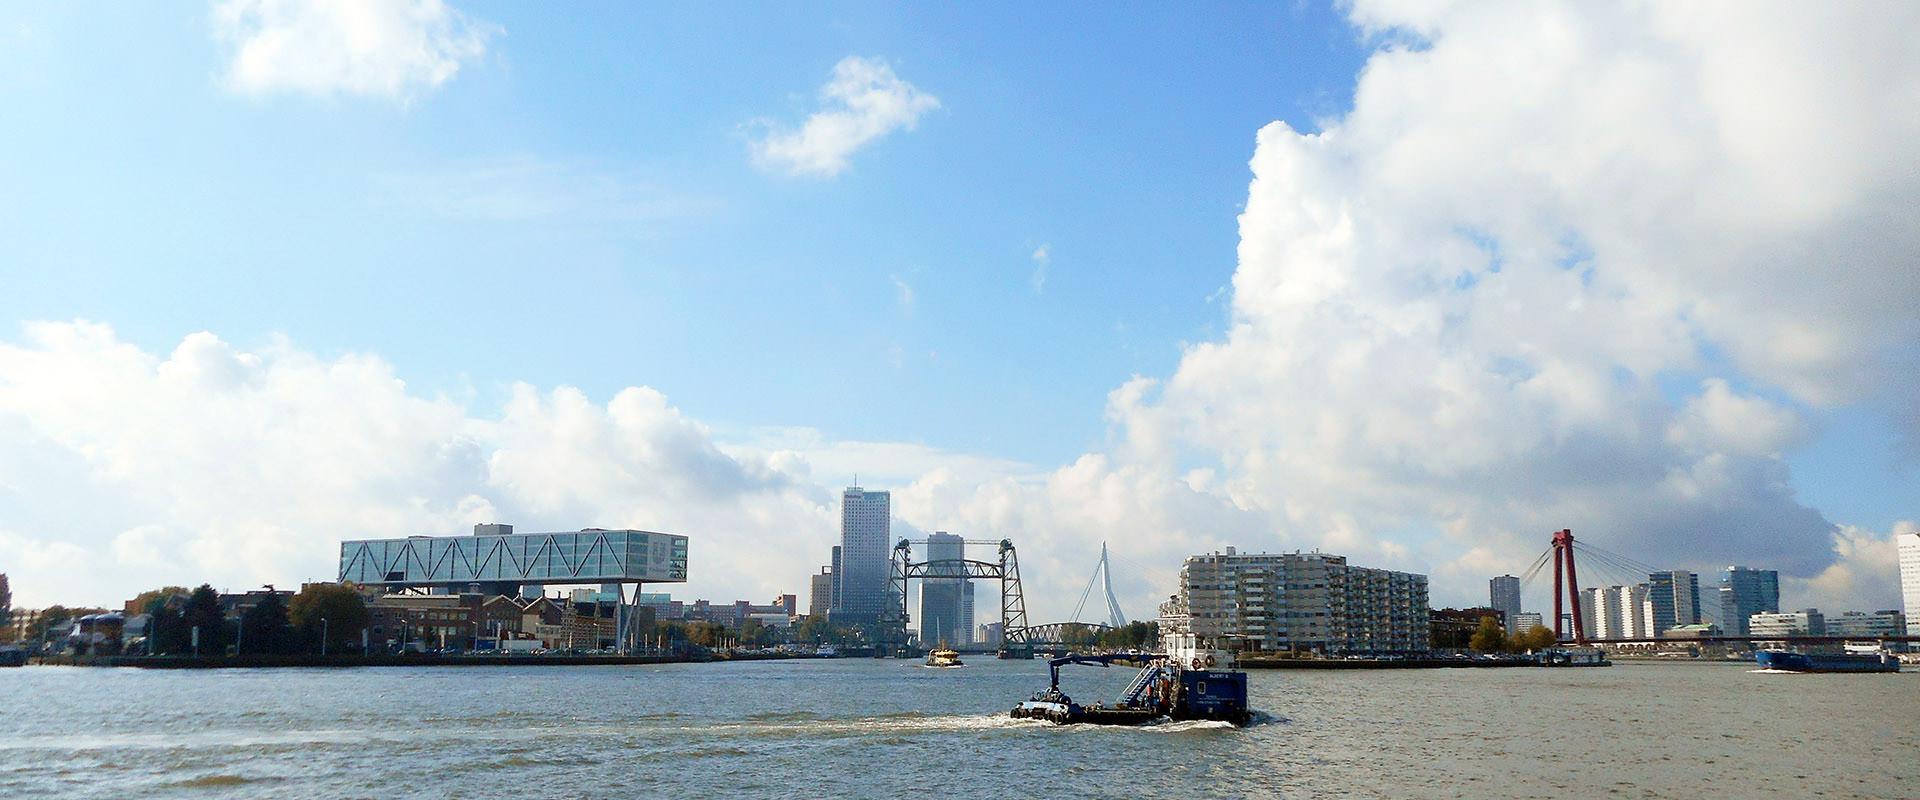 Wat een plek_Hefkwartier_Rotterdam